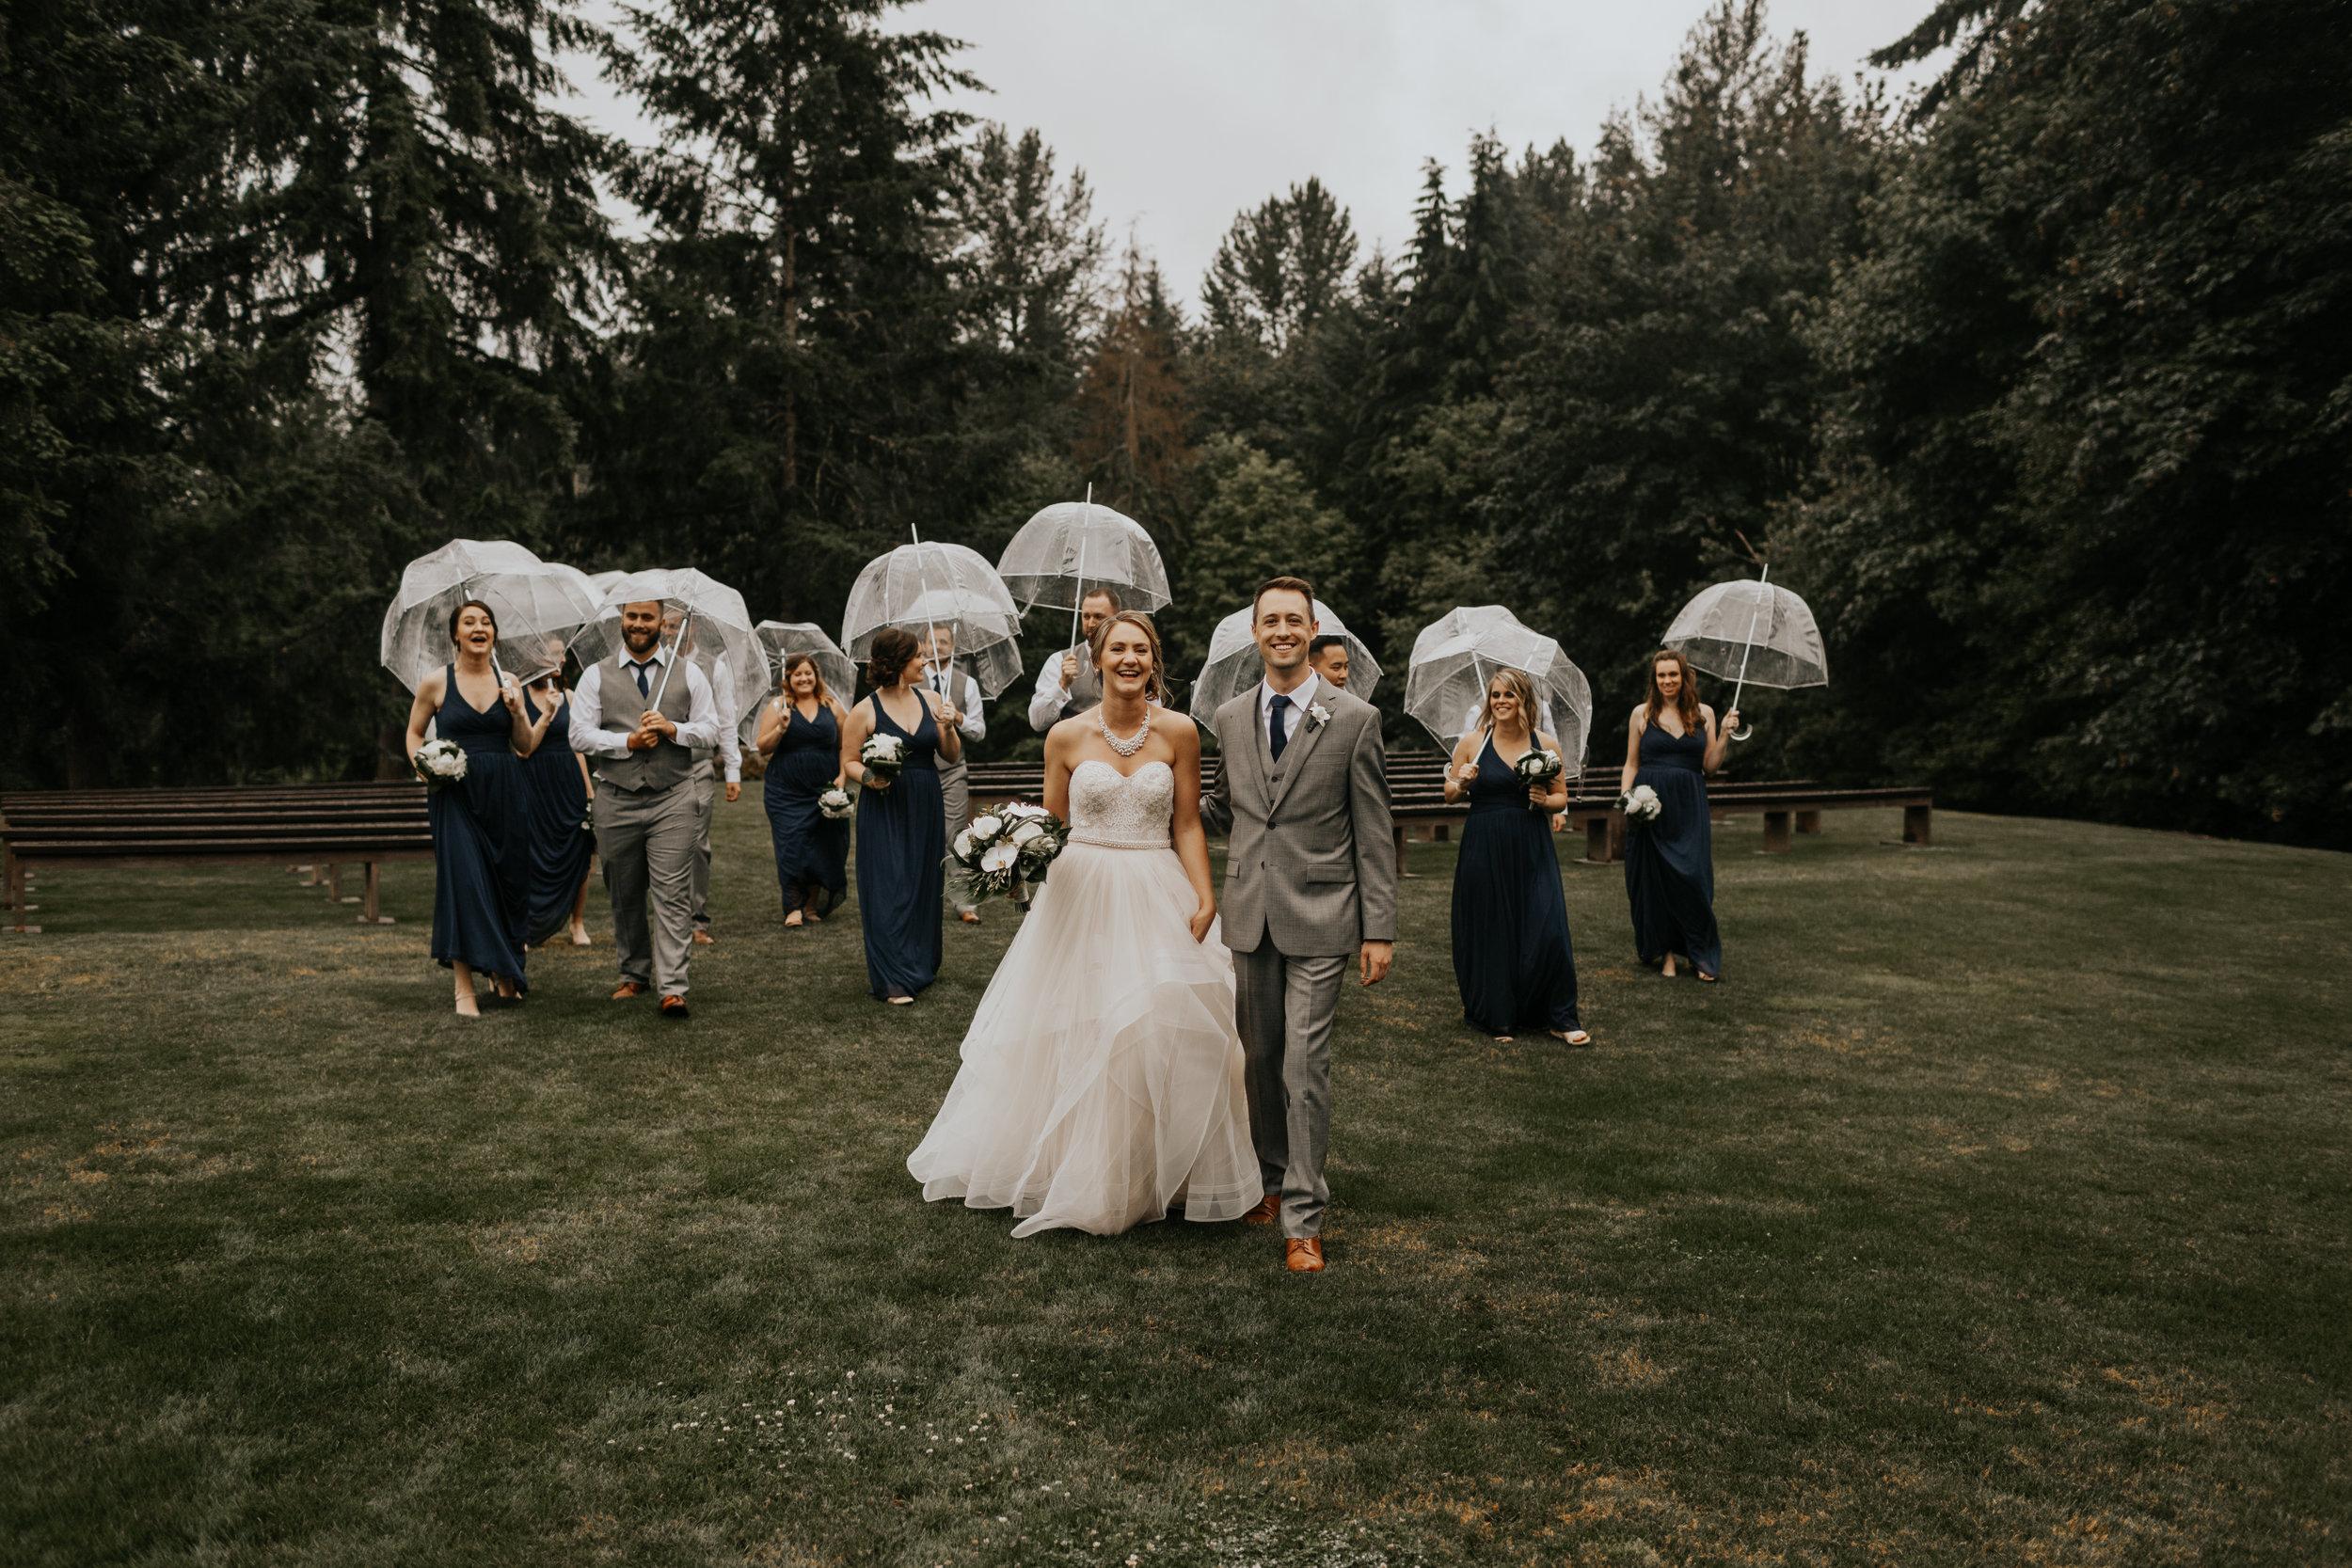 ginapaulson_eriksarah_wedding-498.jpg